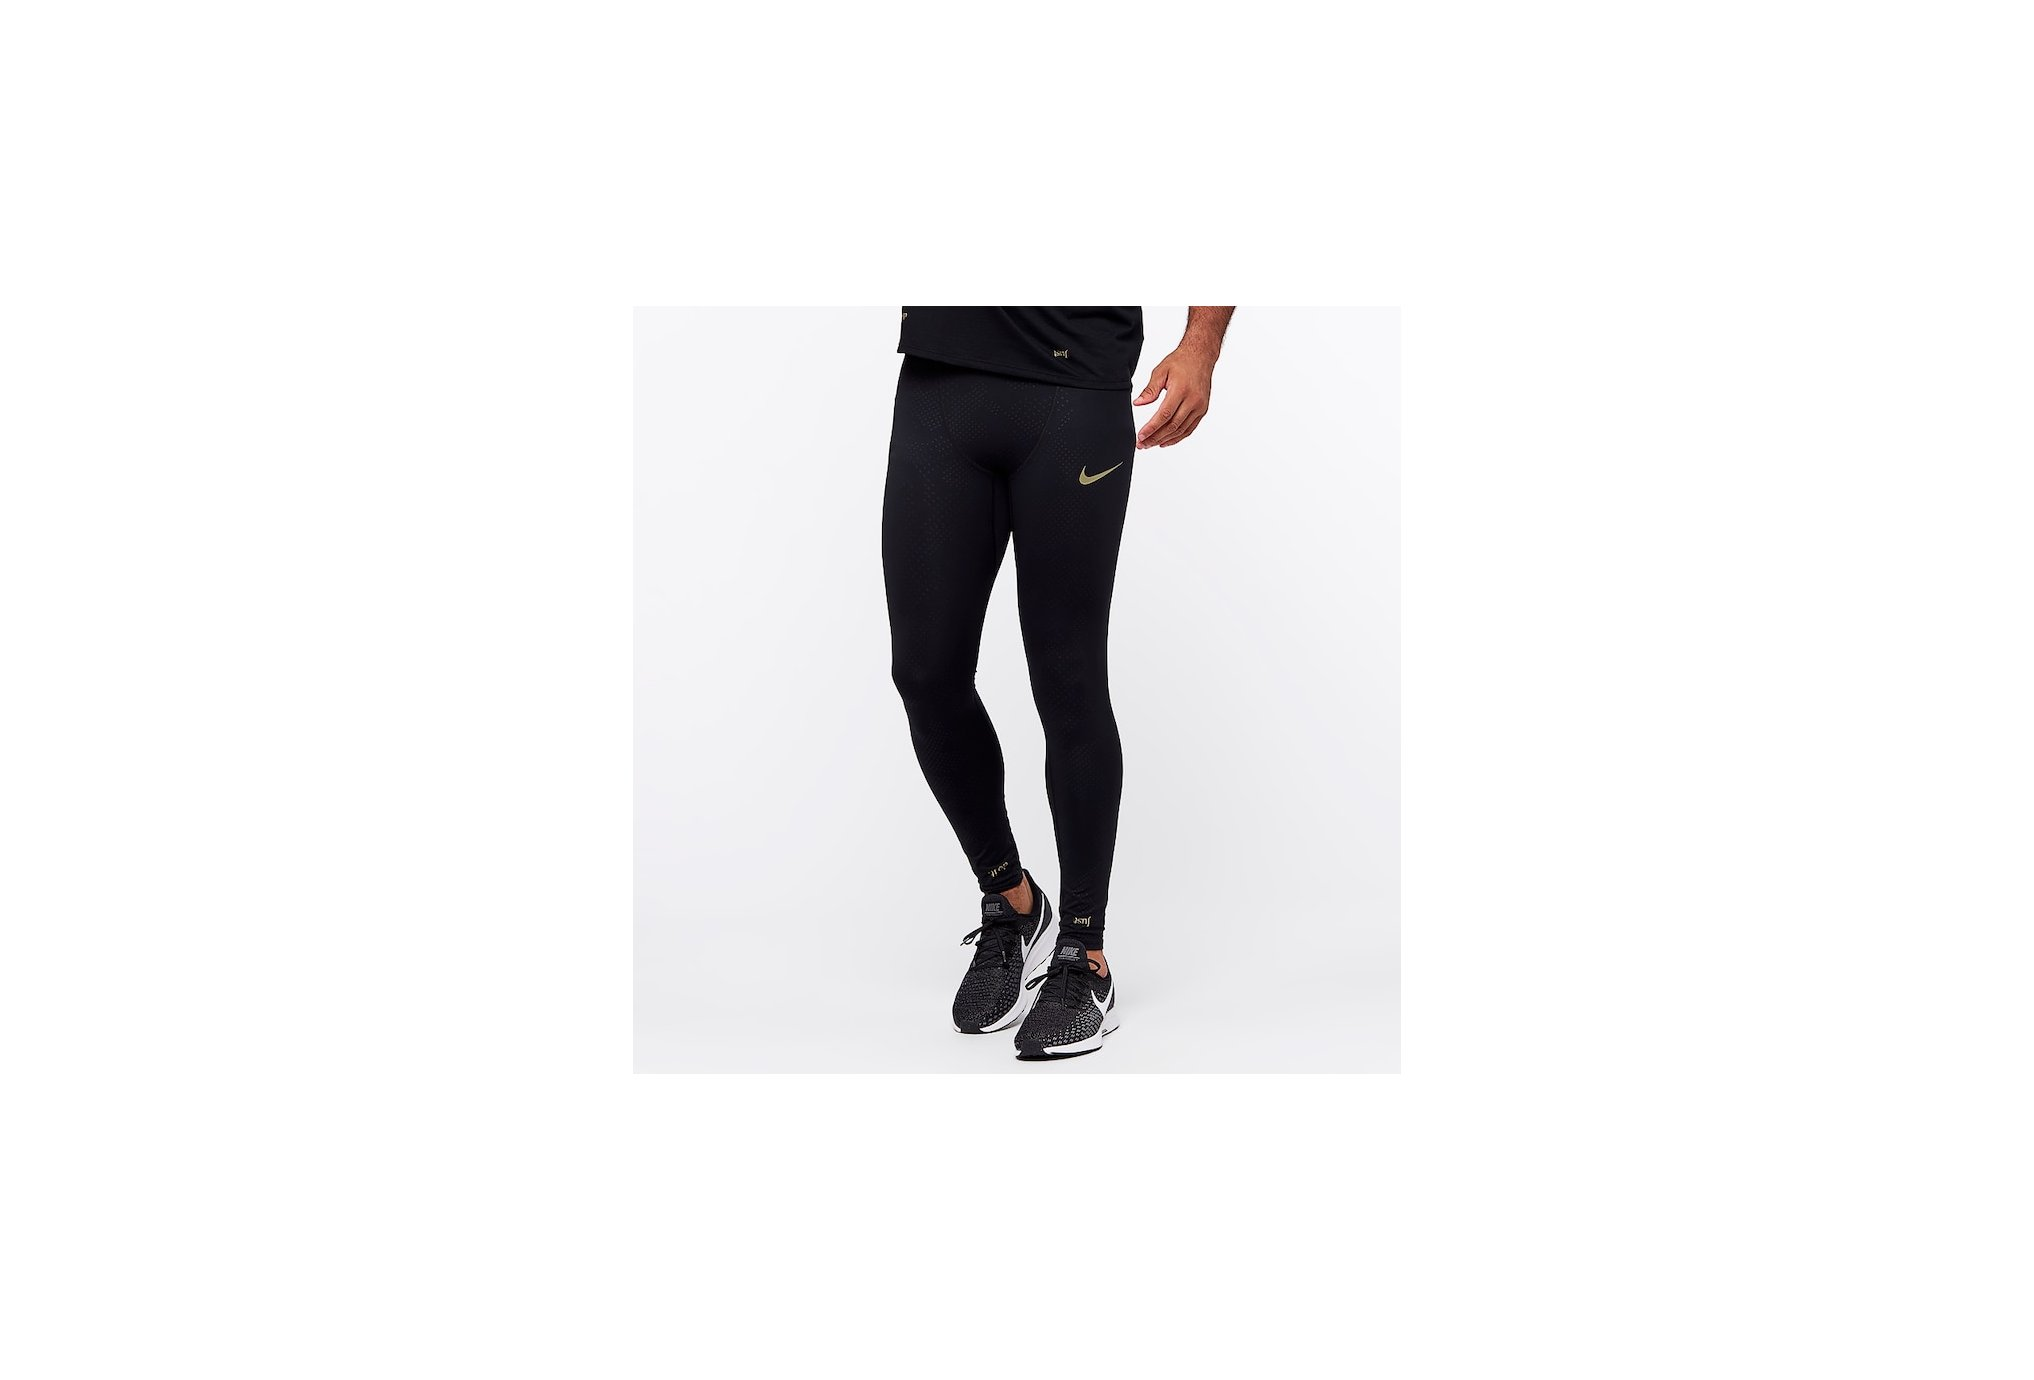 Trail Session - Nike Tech GX M vêtement running homme aaab3b94fee5